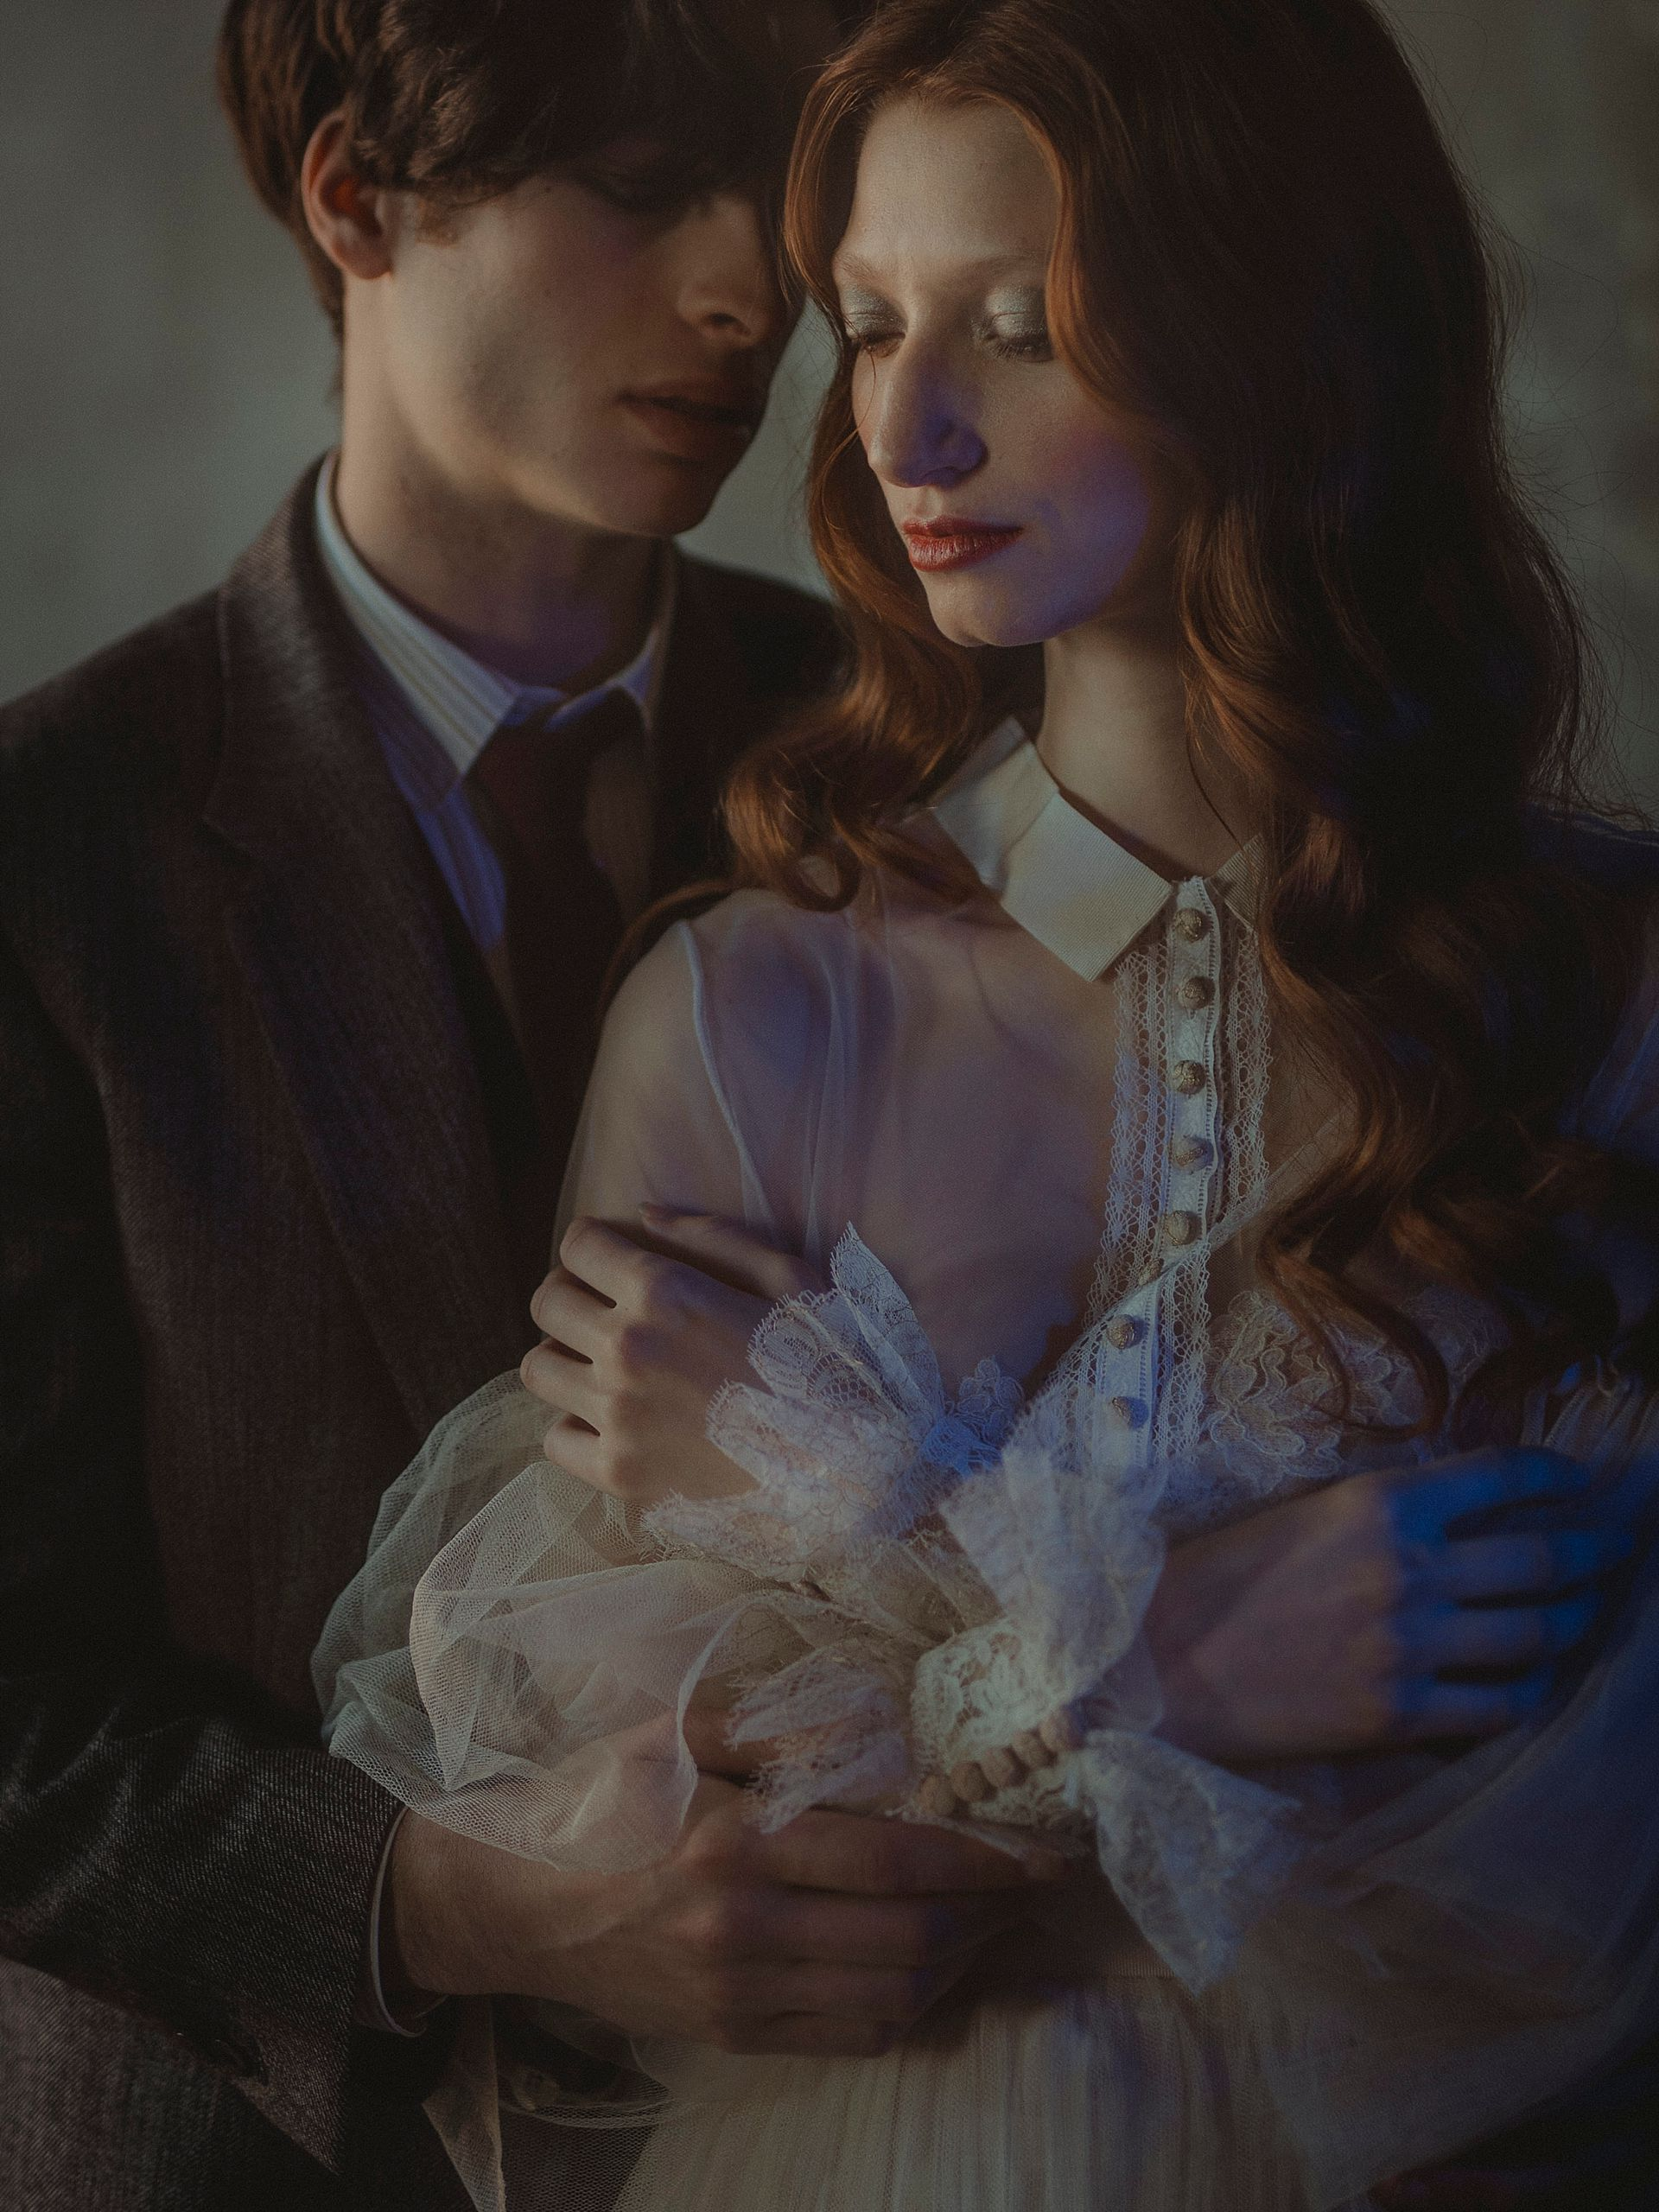 Decadent Wedding Inspiration- Moody Wedding Inspiration- Sudio Fotografico Bacci- Unconventional Wedding- vintage wedding photography